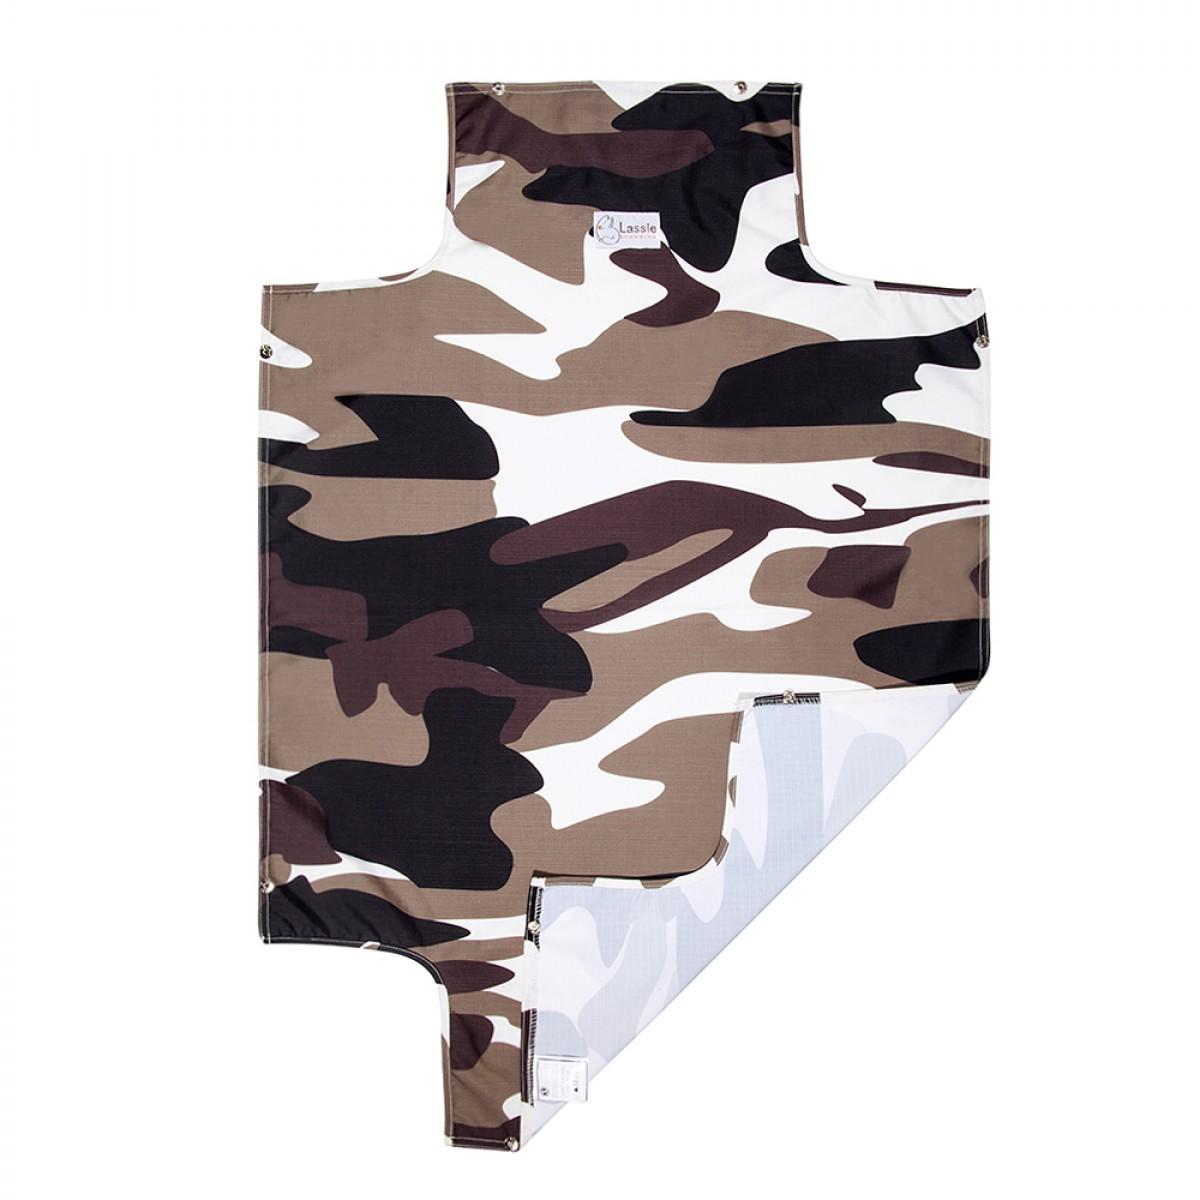 Capa para Cama Suspensa - Camuflada